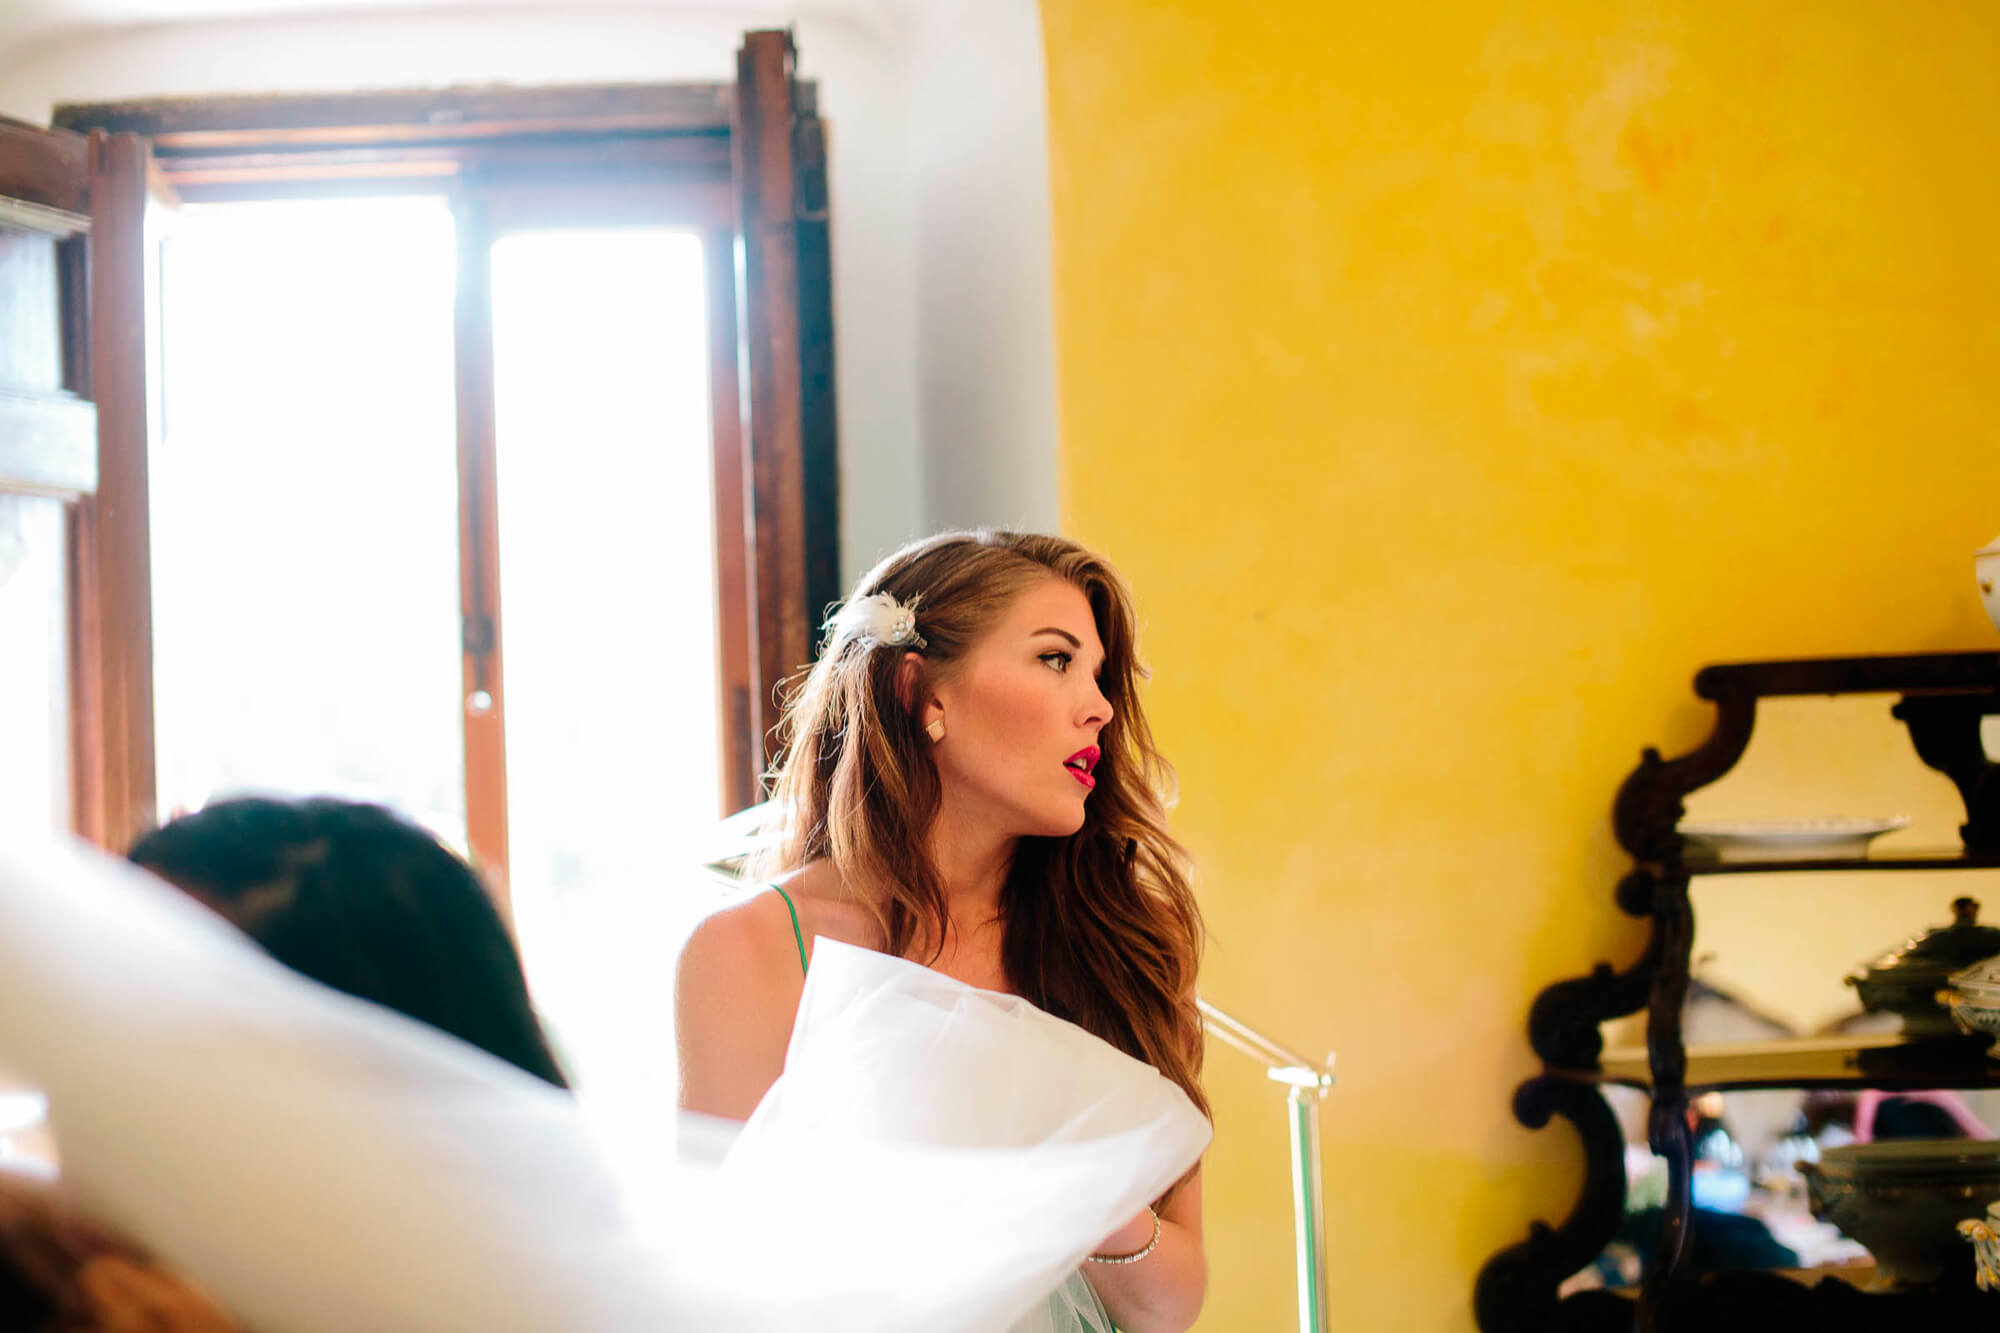 038-sorrento-wedding-photographer.jpg